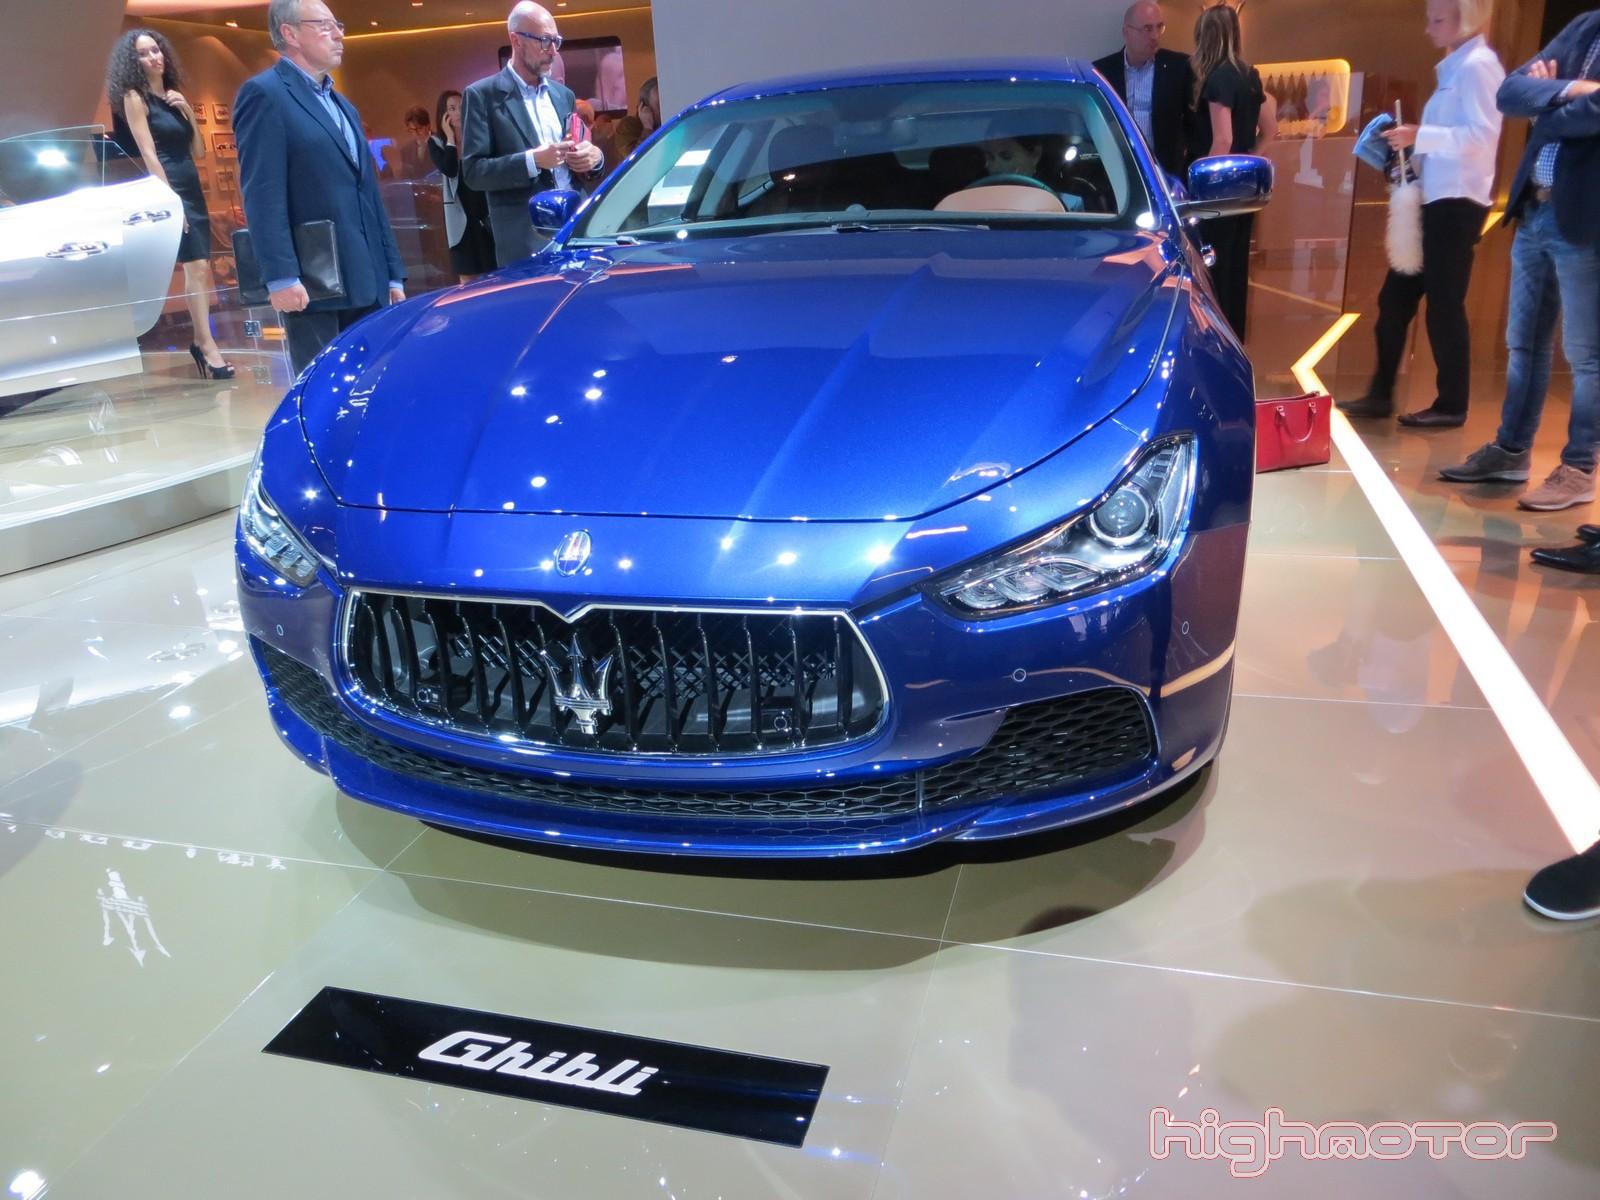 Maserati en el Salón de Frankfurt 2013